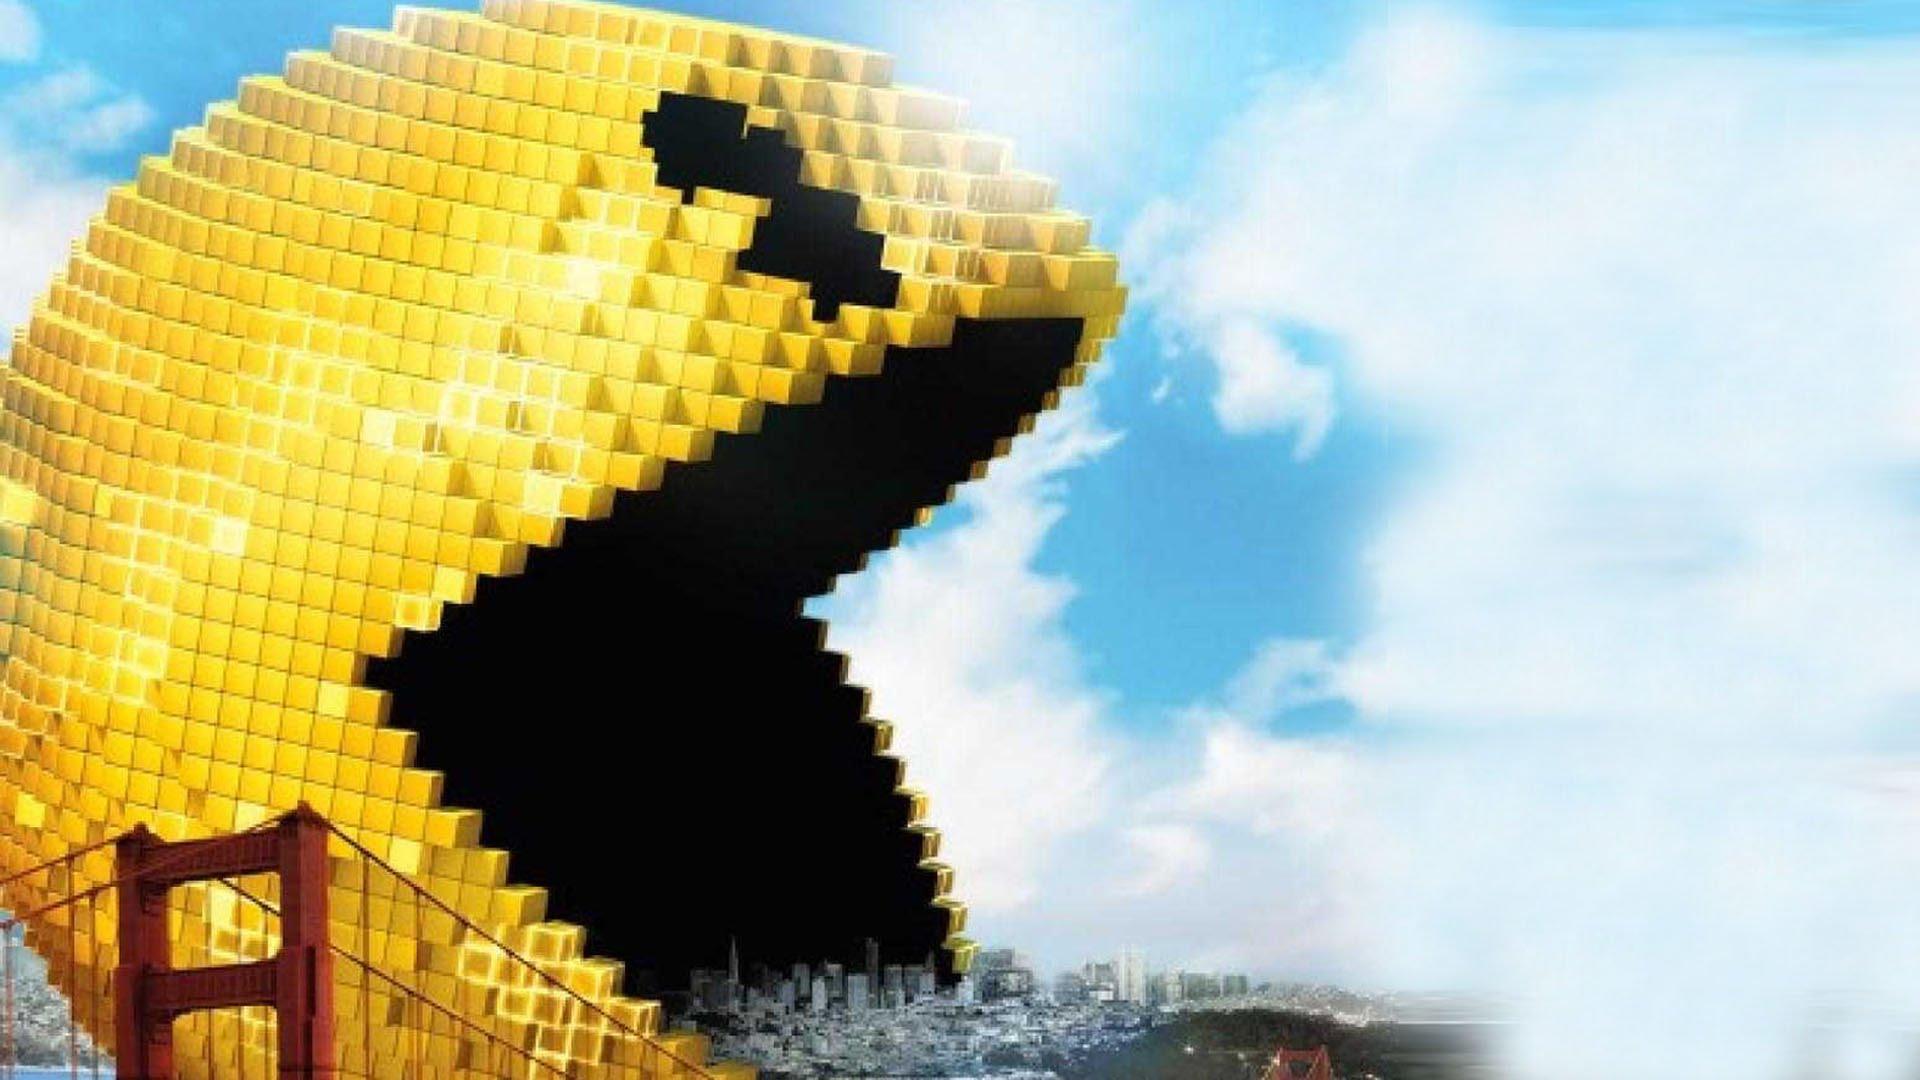 Wonderful Wallpaper Movie Pixels - Pixels-Movie-Wallpaper-For-Desktop  2018_37206.jpg